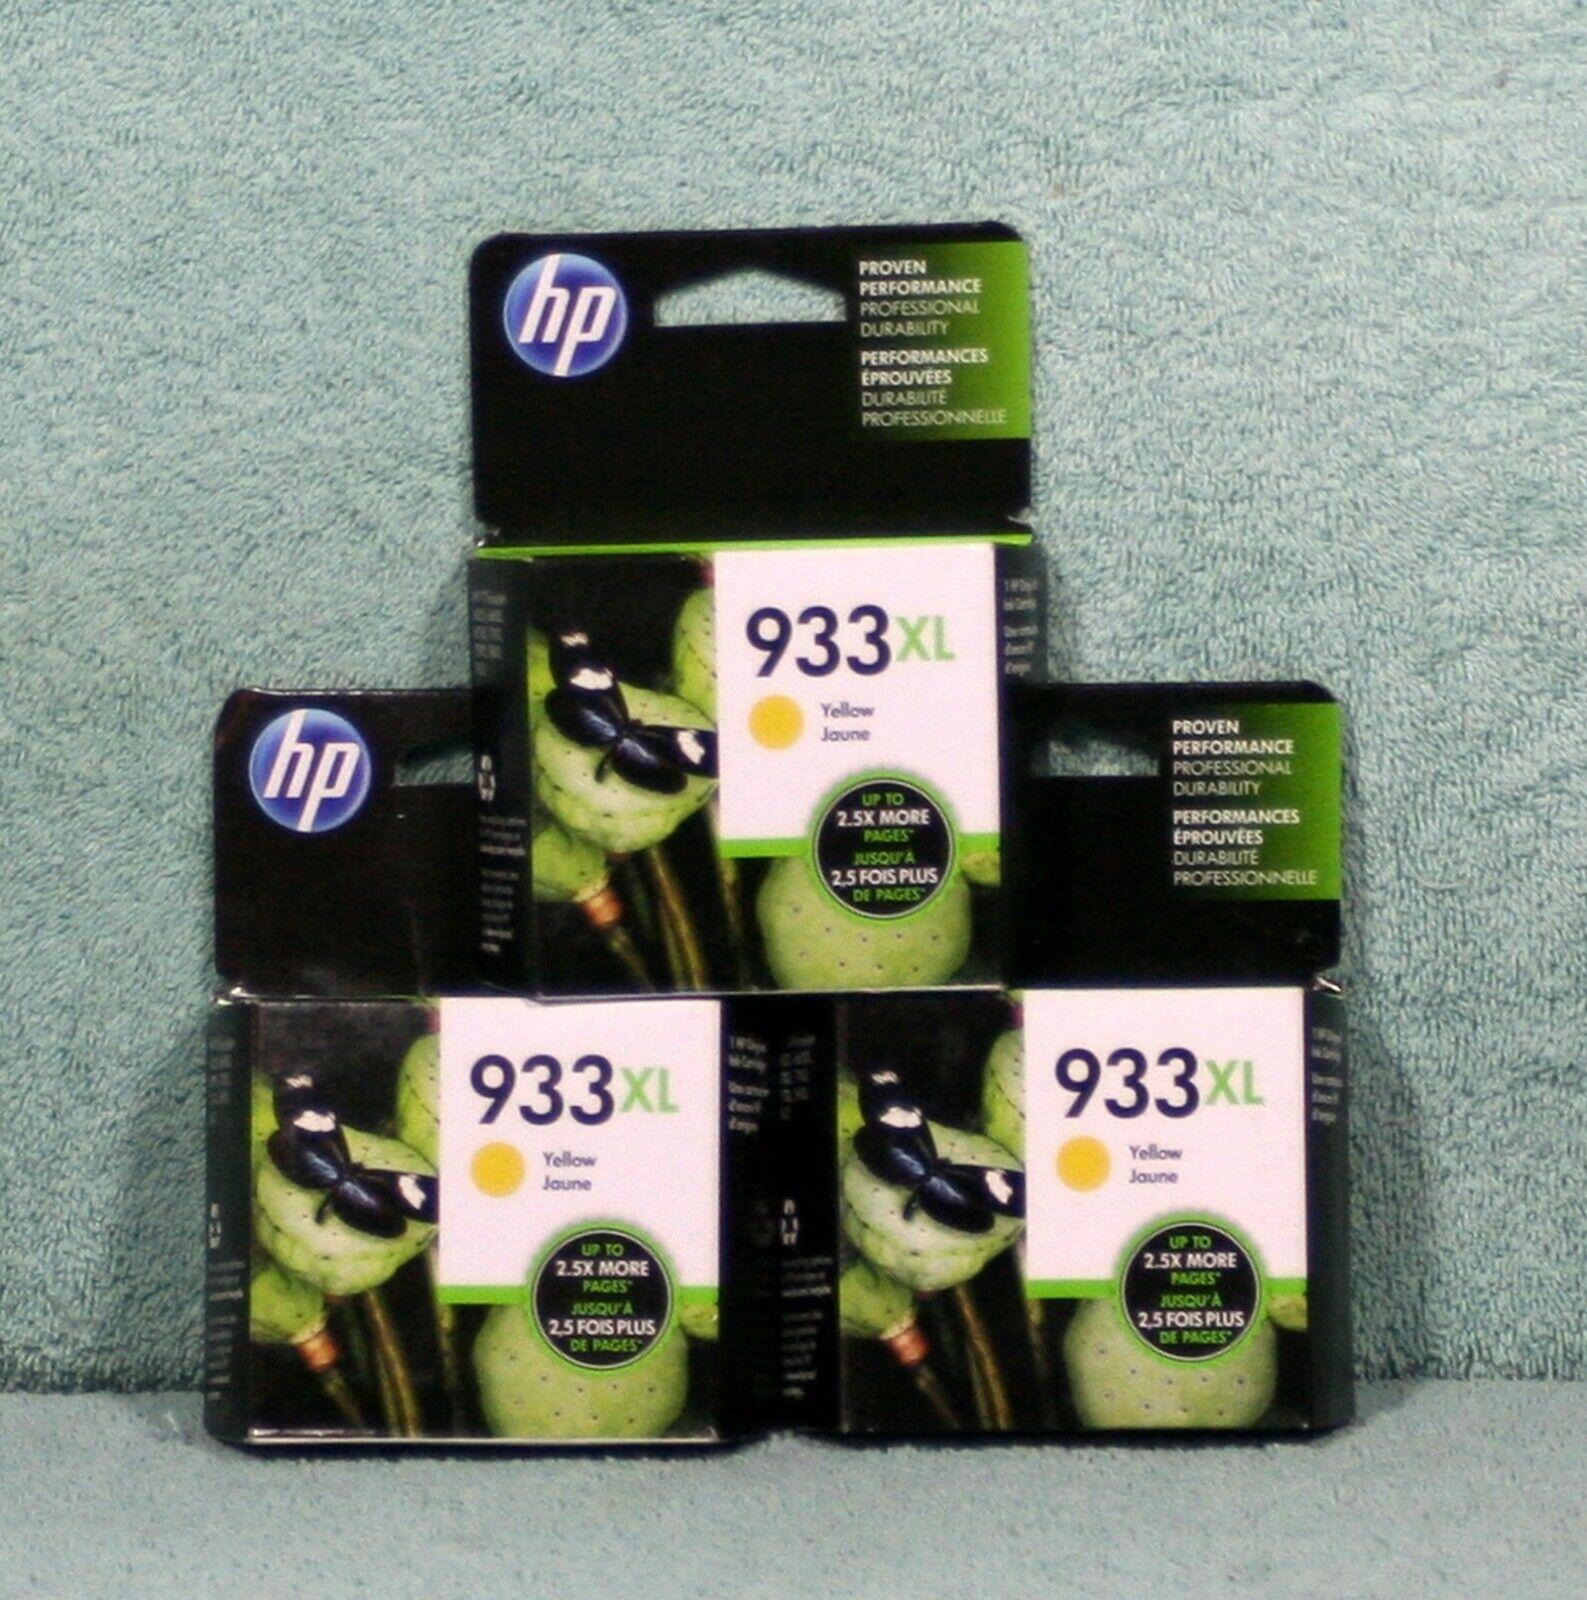 HP Original Genuine Replacement Ink Cartridge Yellow 933XL Exp. 03/22 New In Box - $18.95